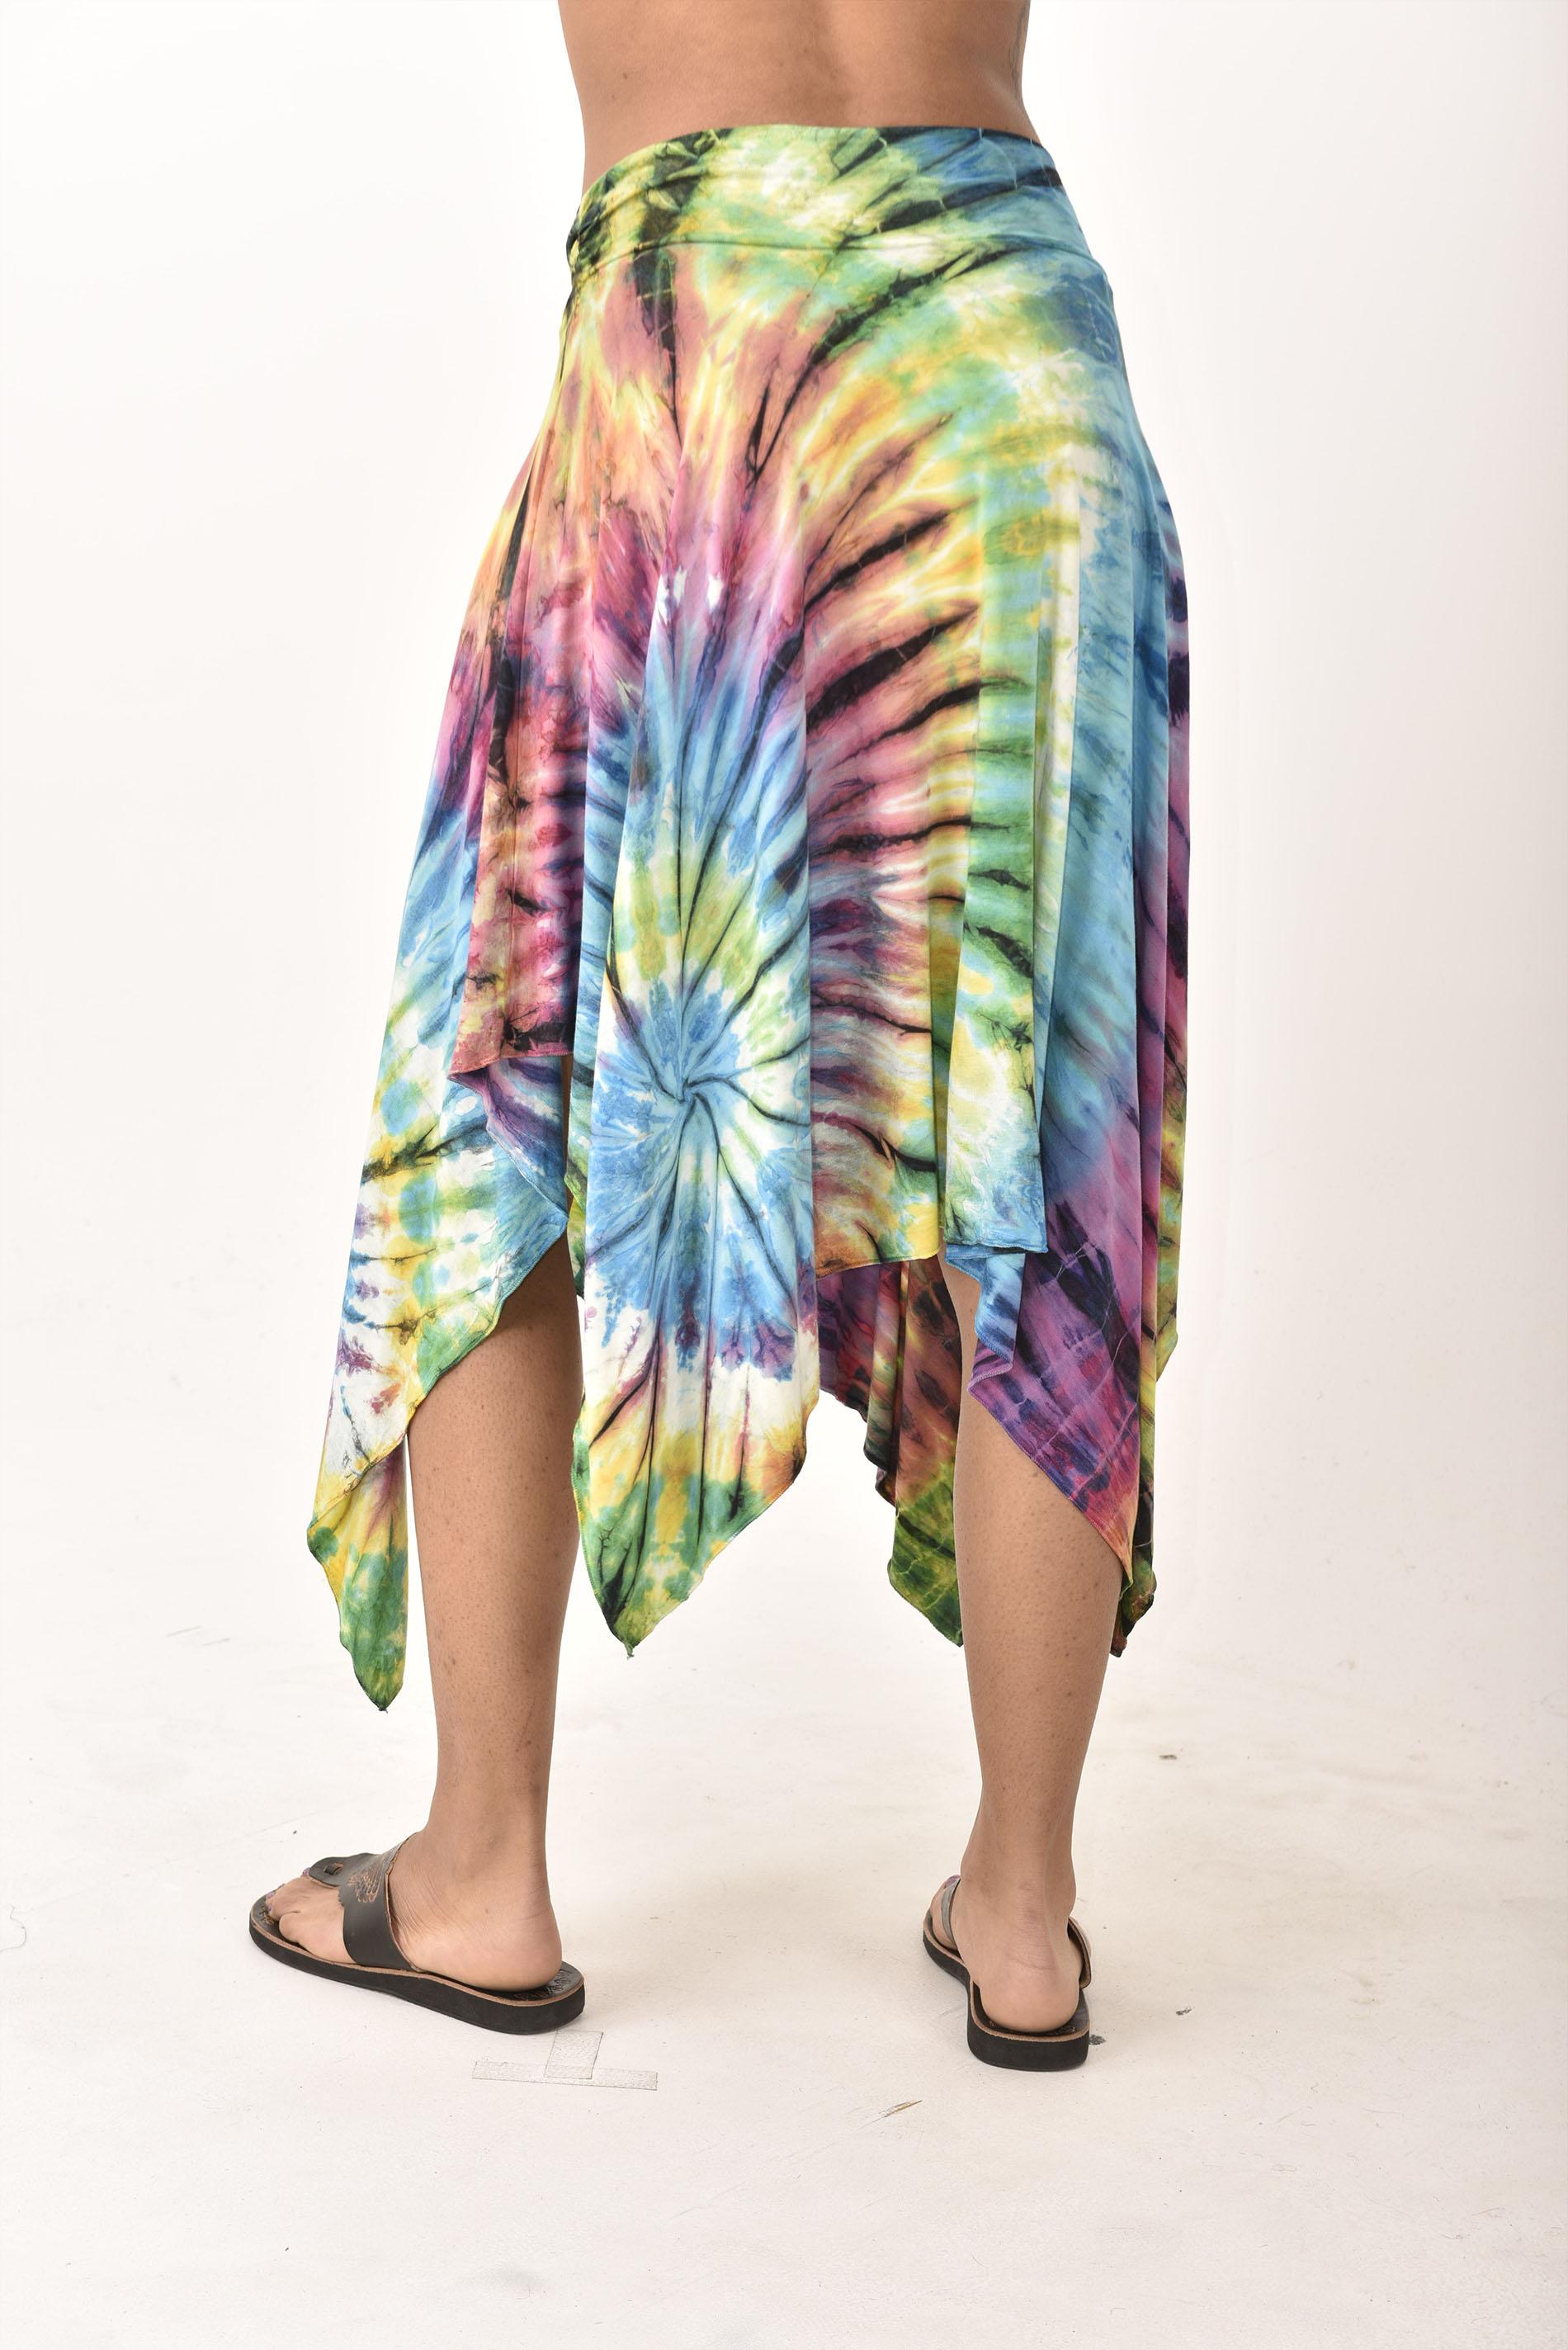 Hand Painted Tie Dye Fairy Skirt Rainbow